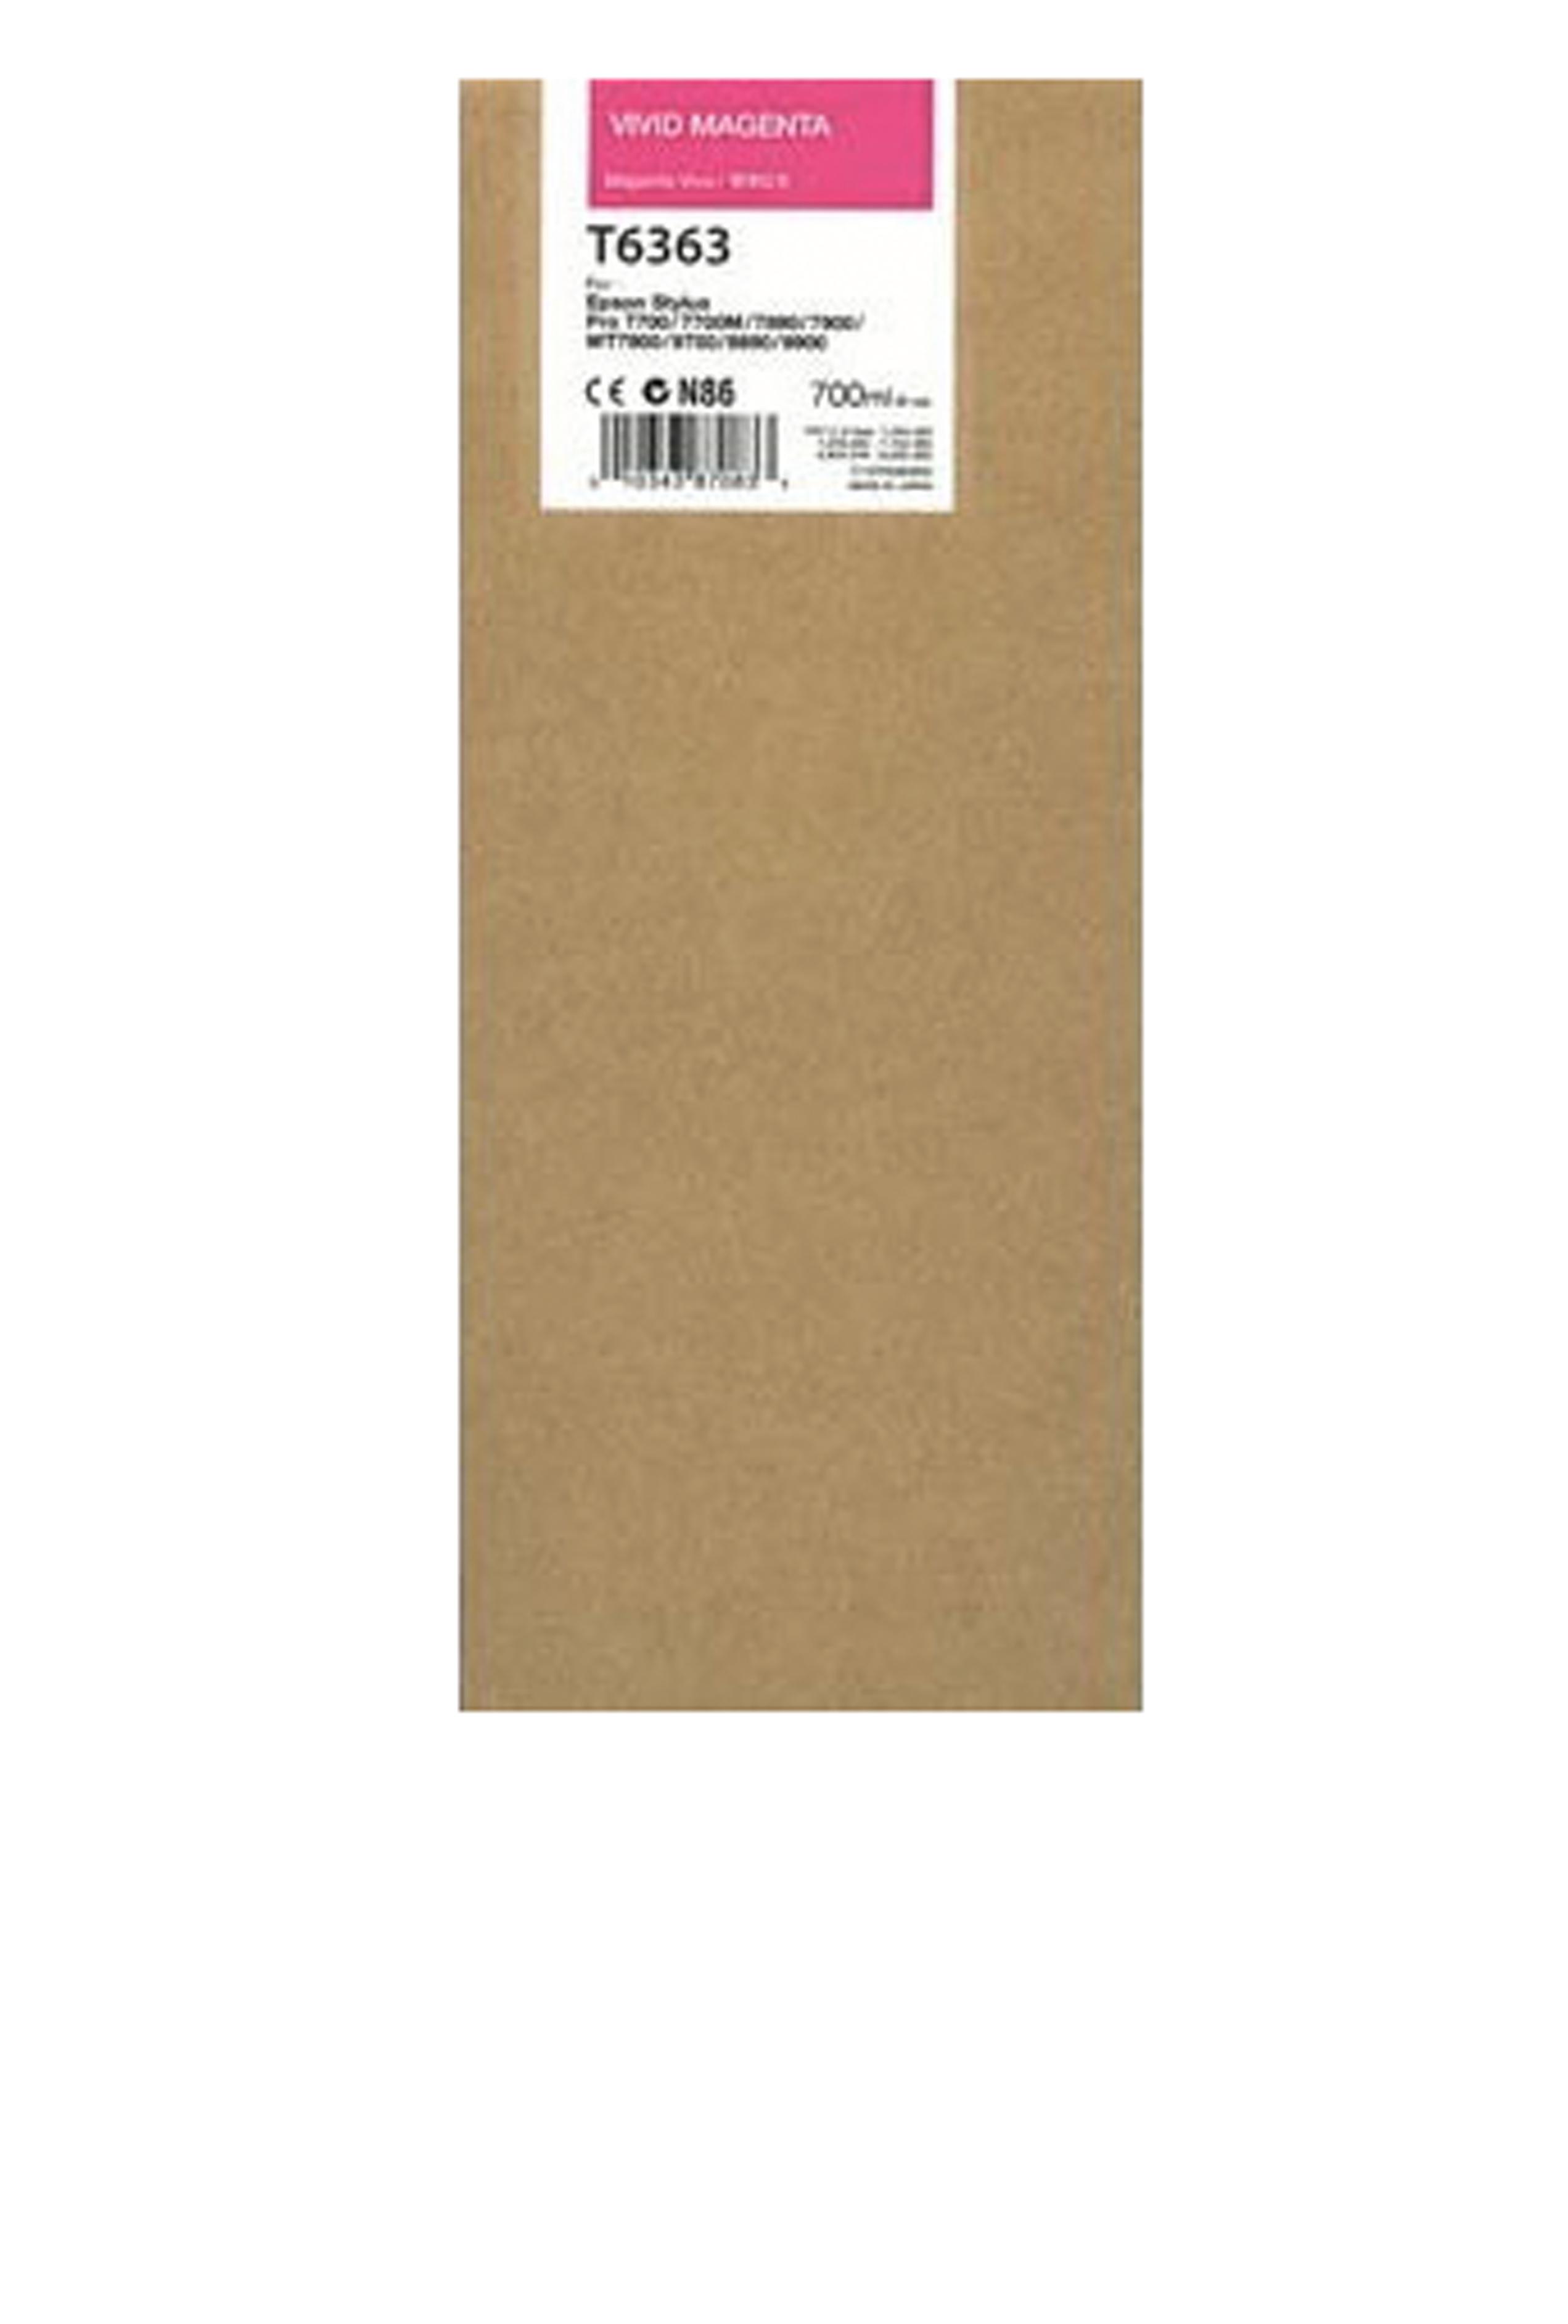 Epson EPSON HI VIVID MAGENTA INK (700 ML) (T636300)